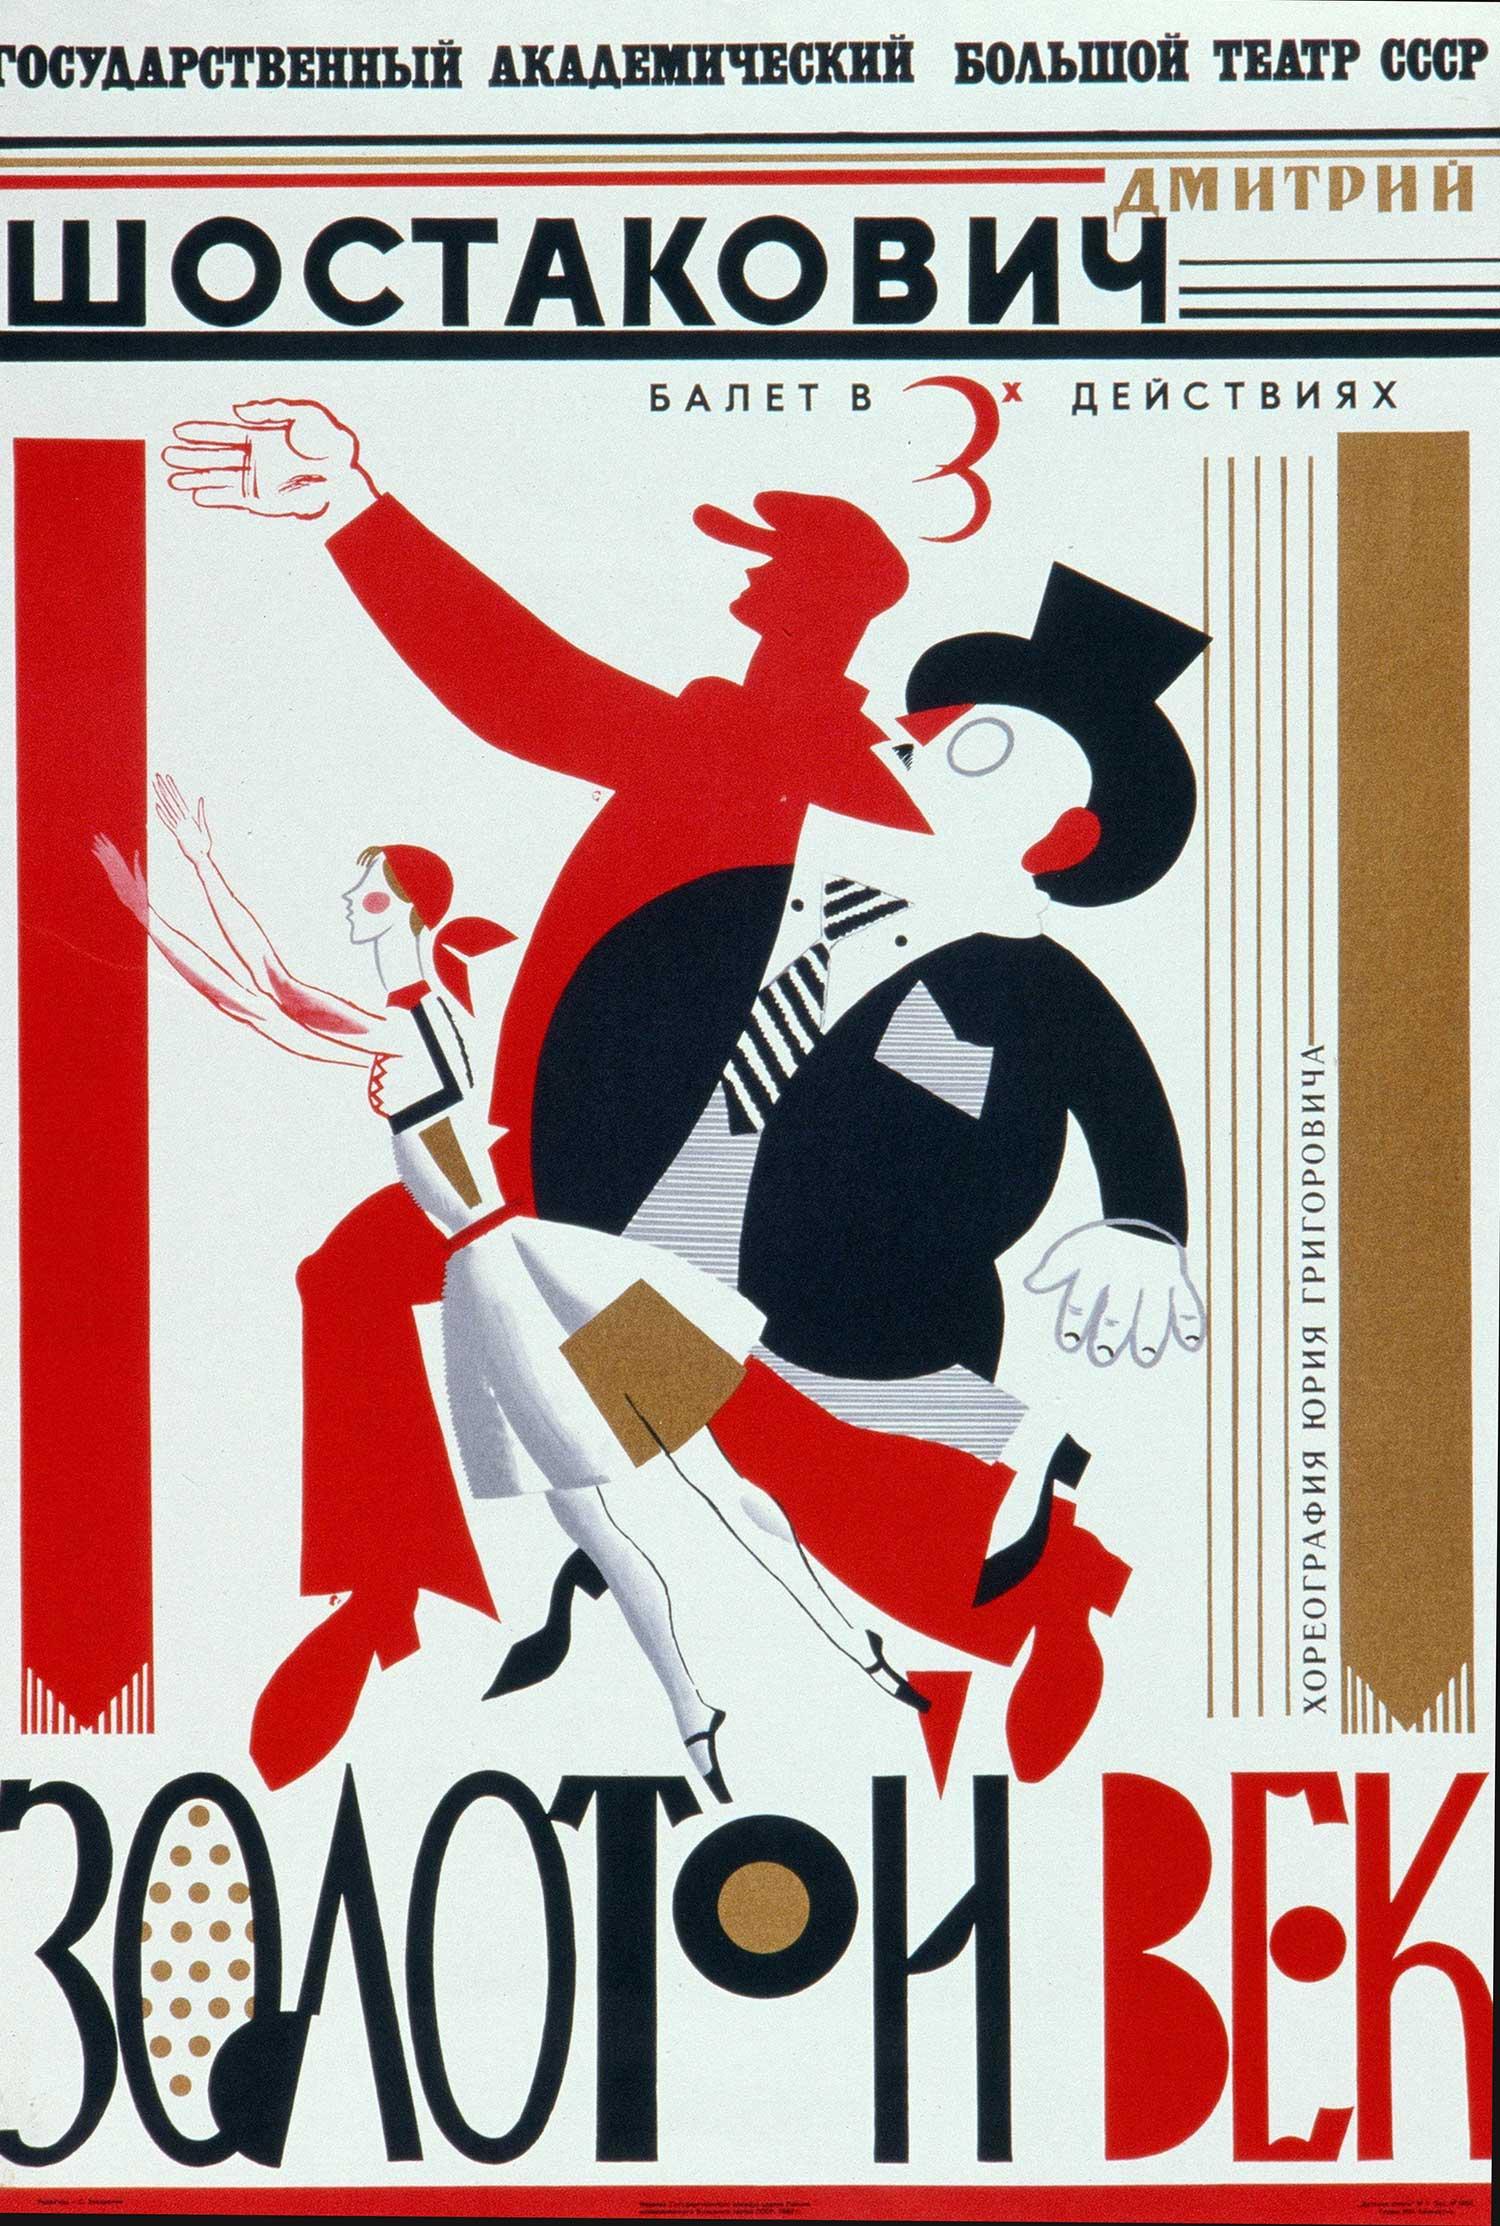 ron-miriello-grafico-soviet-posters-aiga-san-diego-community-design-Miriello-branding-officina-9.jpg